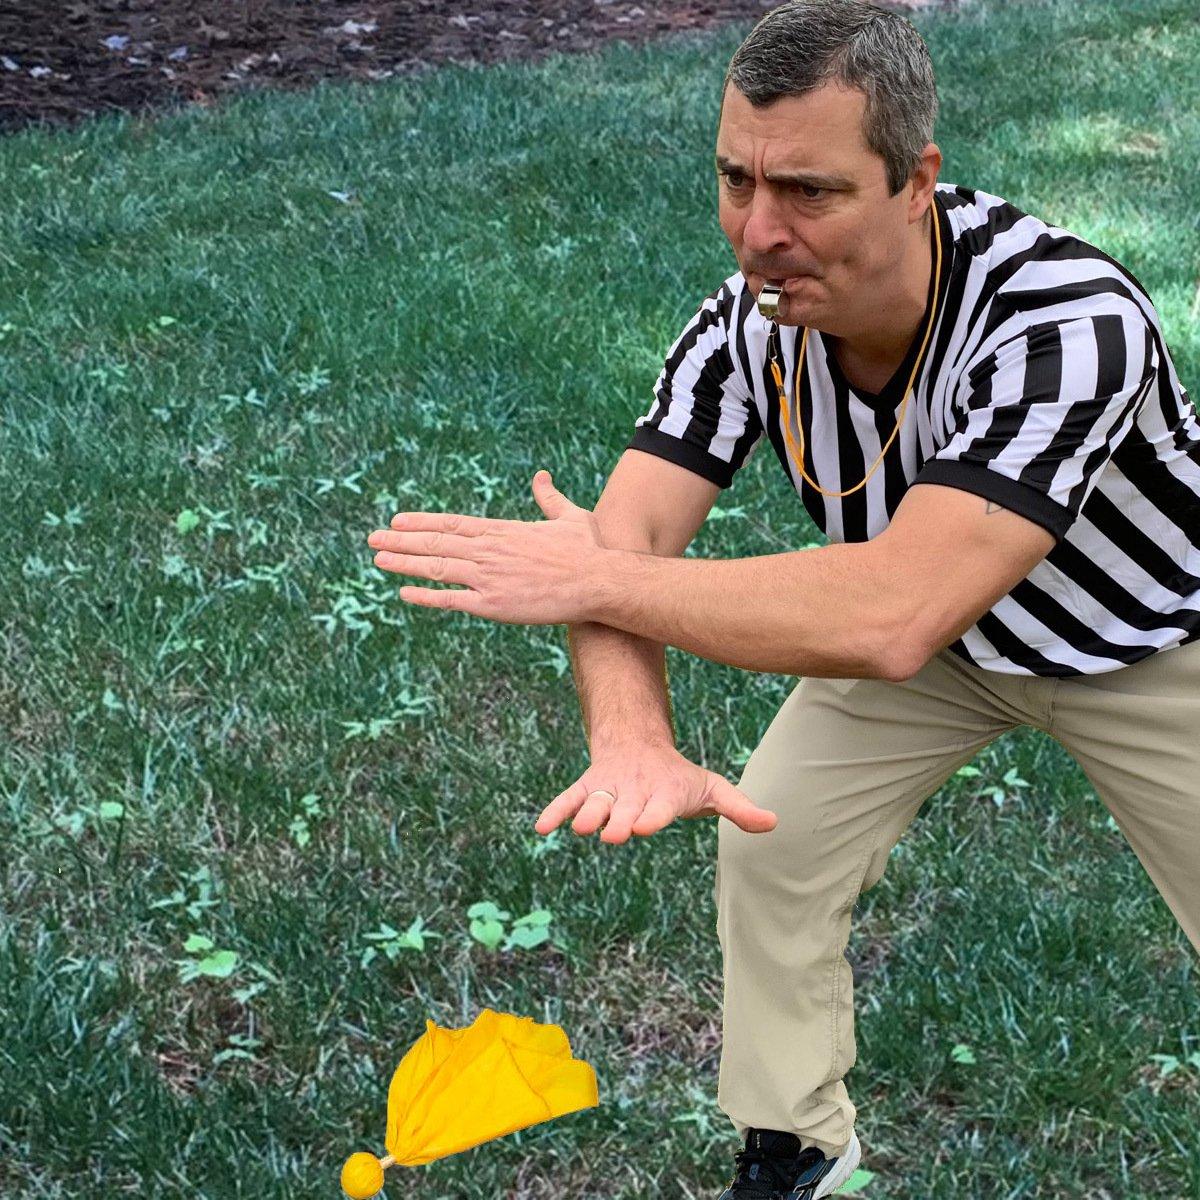 Greg_Flag_Weeds_lawn_coach